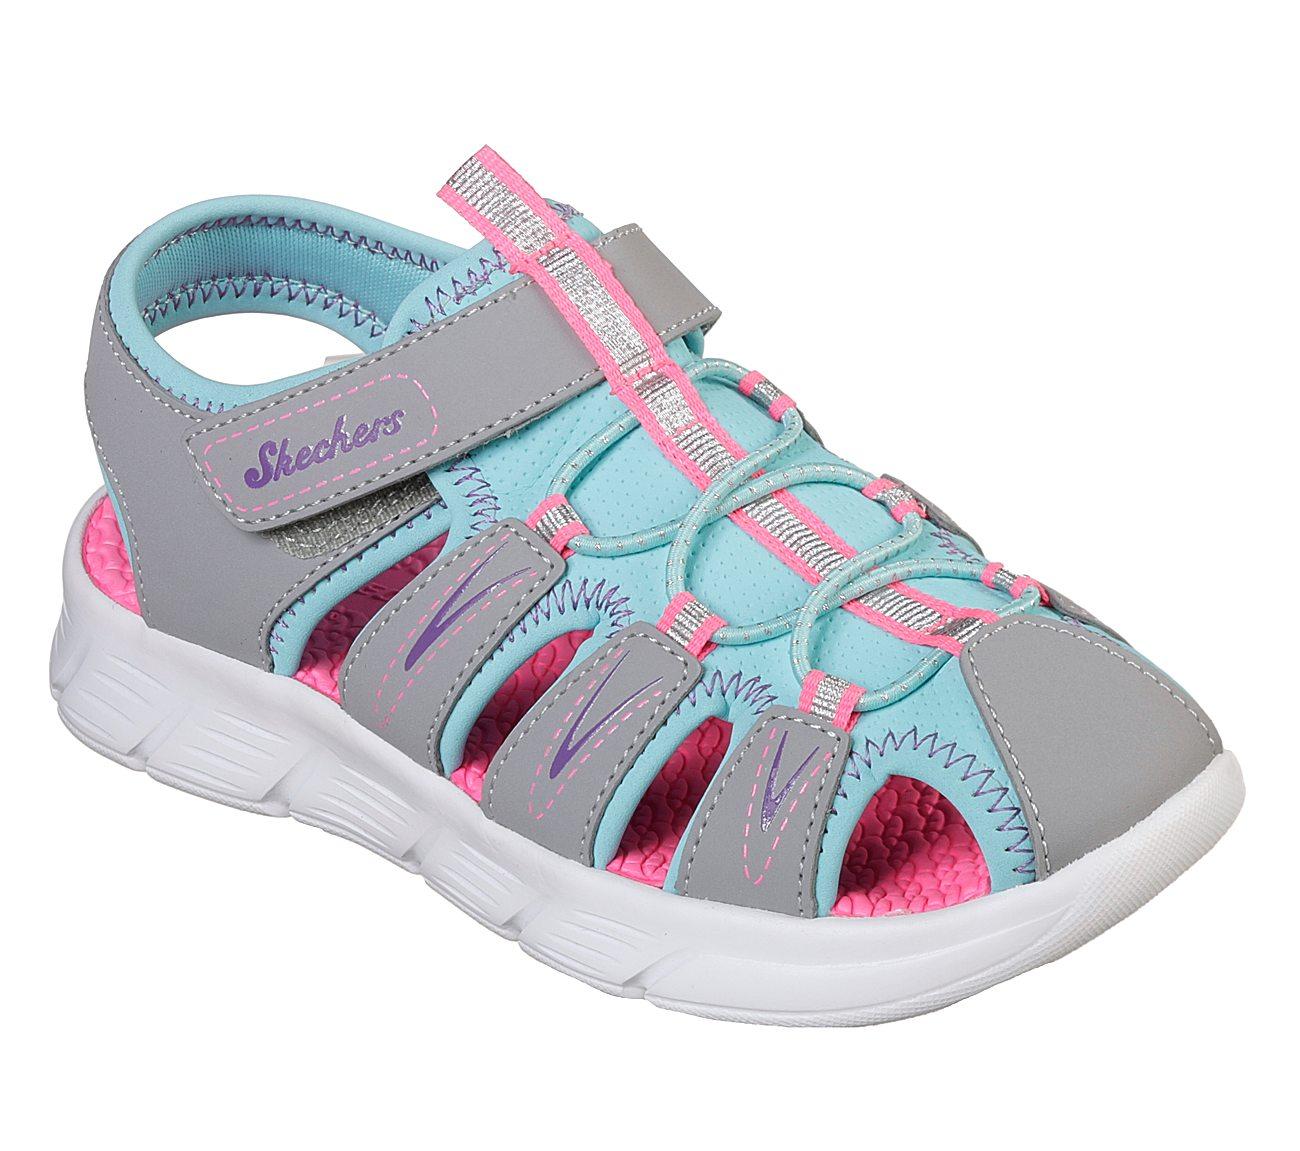 SKECHERS C-Flex Sandal SKECHERS USA Shoes